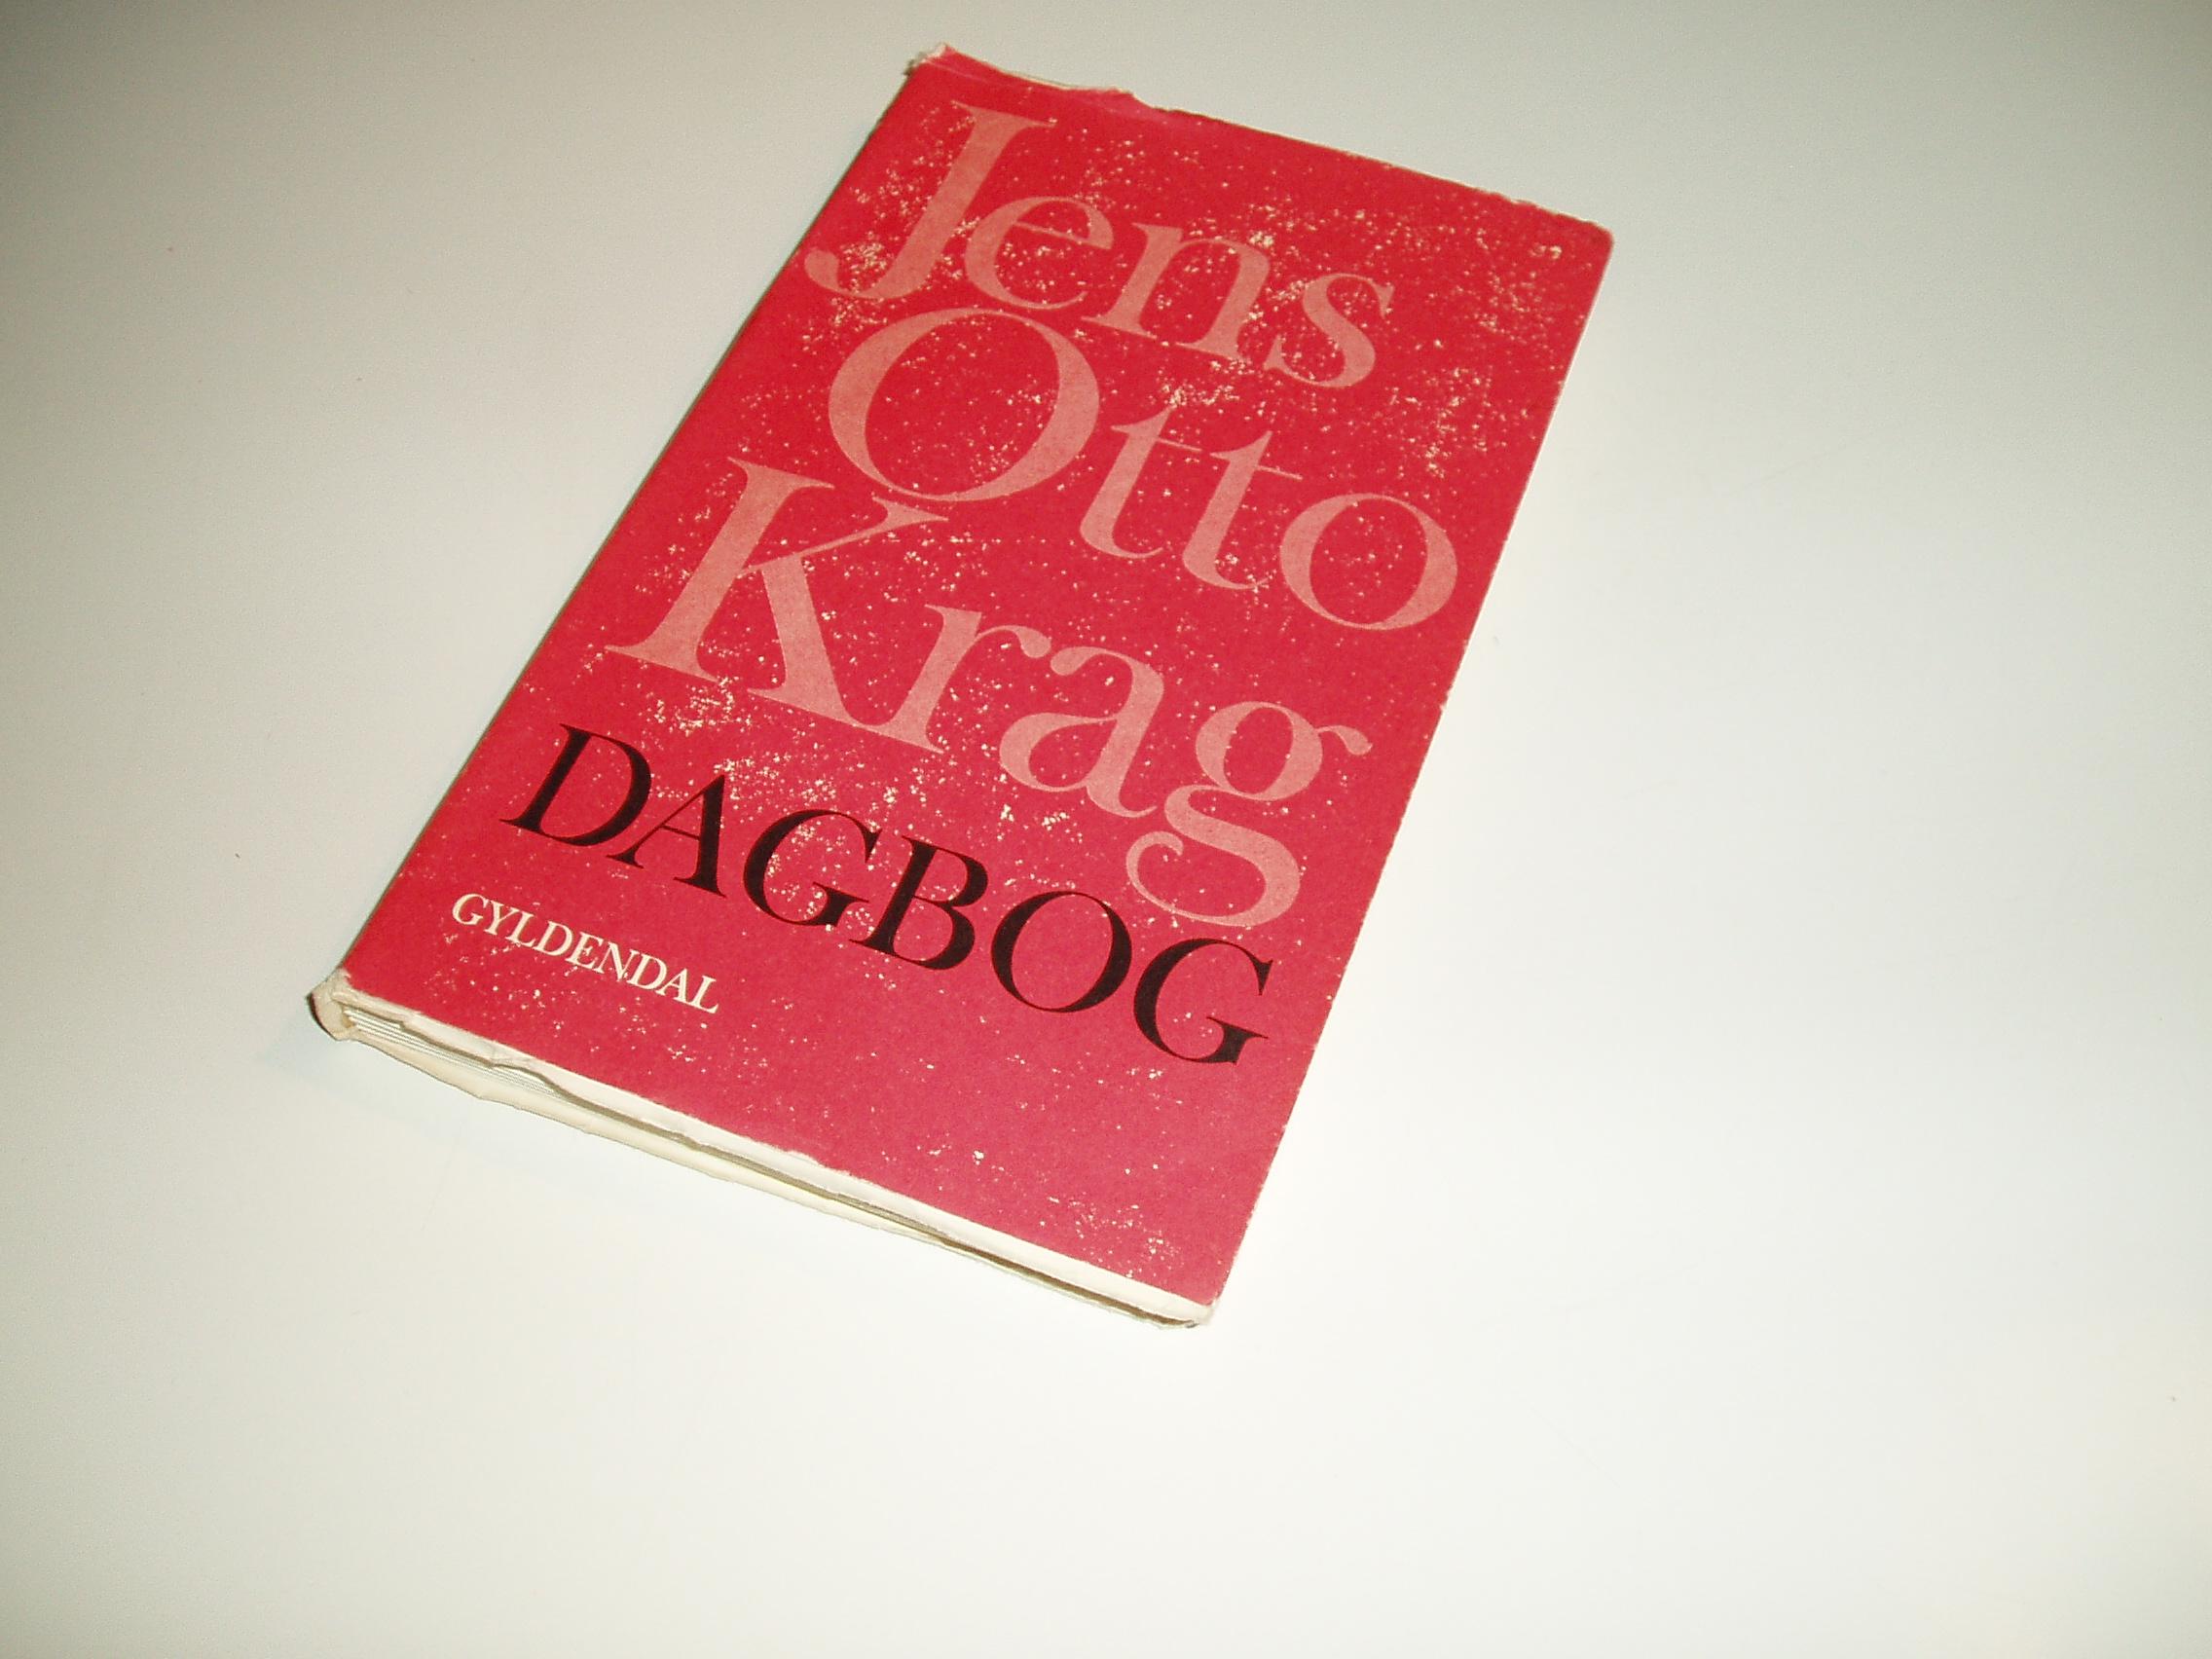 Dagbog 1971-1972